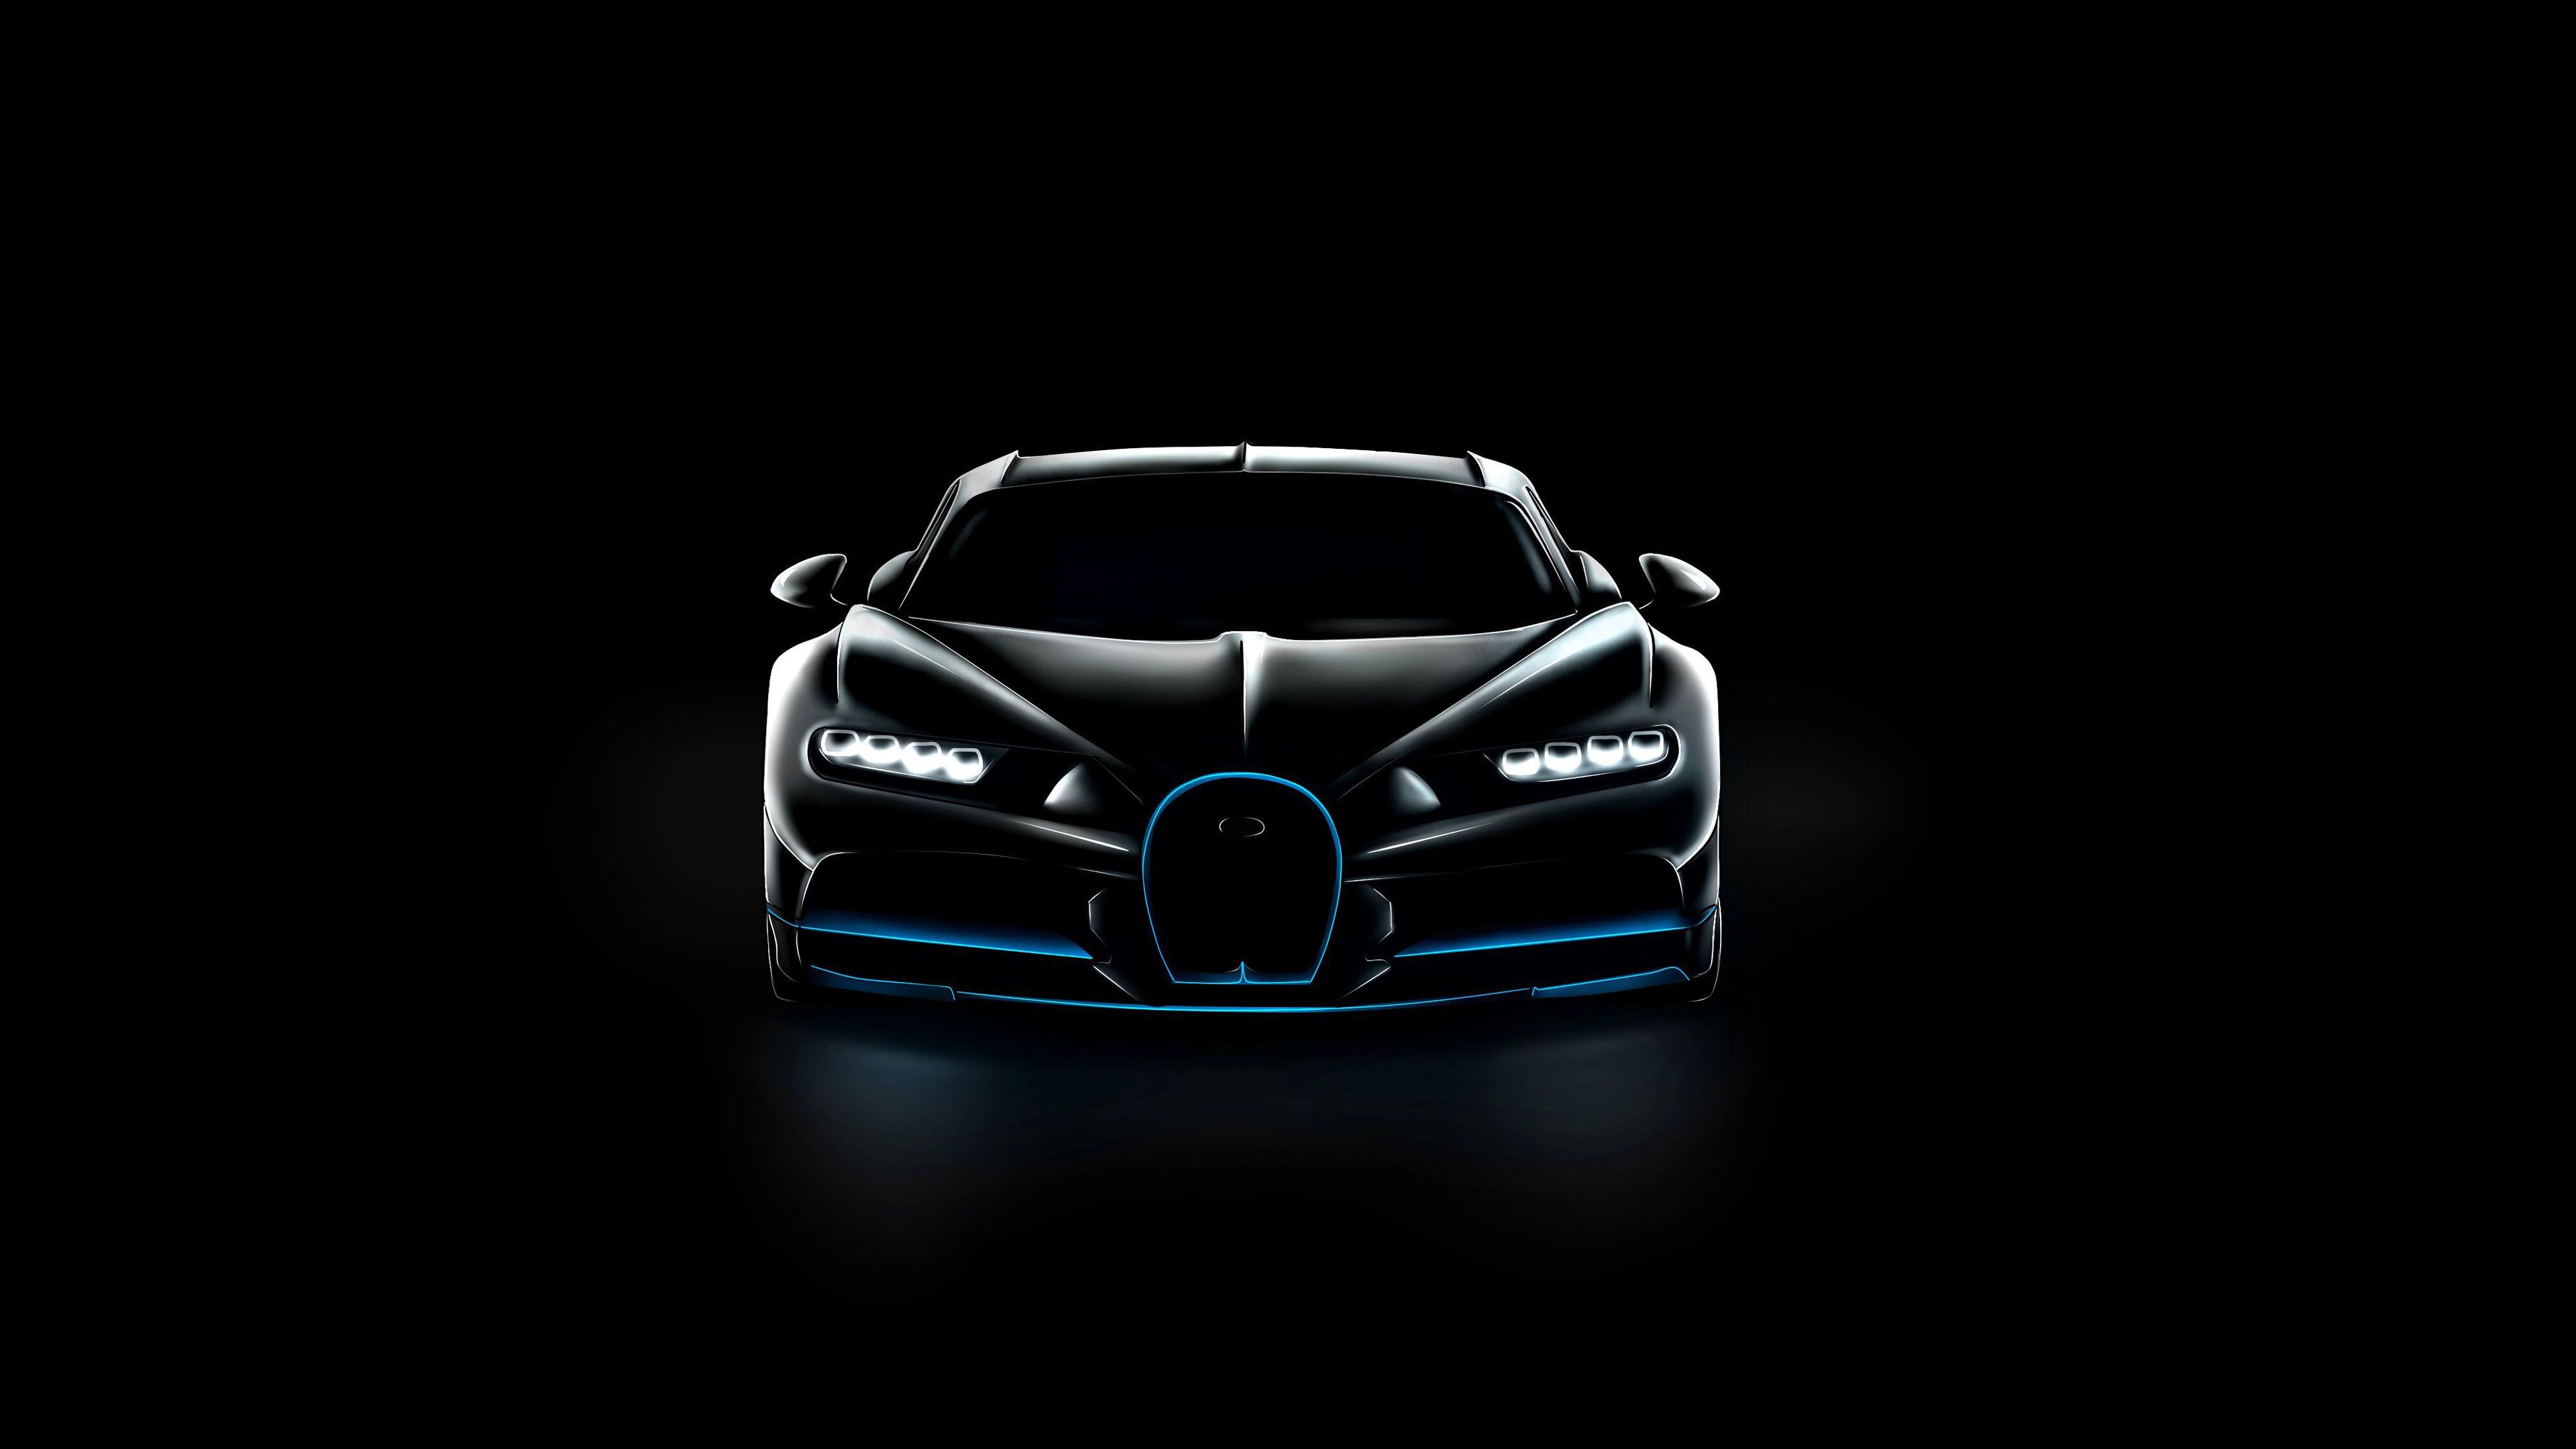 Bugatti Chiron Sport 4k Hd Wallpapers Cars Wallpapers Bugatti Wallpapers Bugatti Chiron Wallpape Bugatti Chiron Bugatti Wallpapers Bugatti Chiron Wallpapers